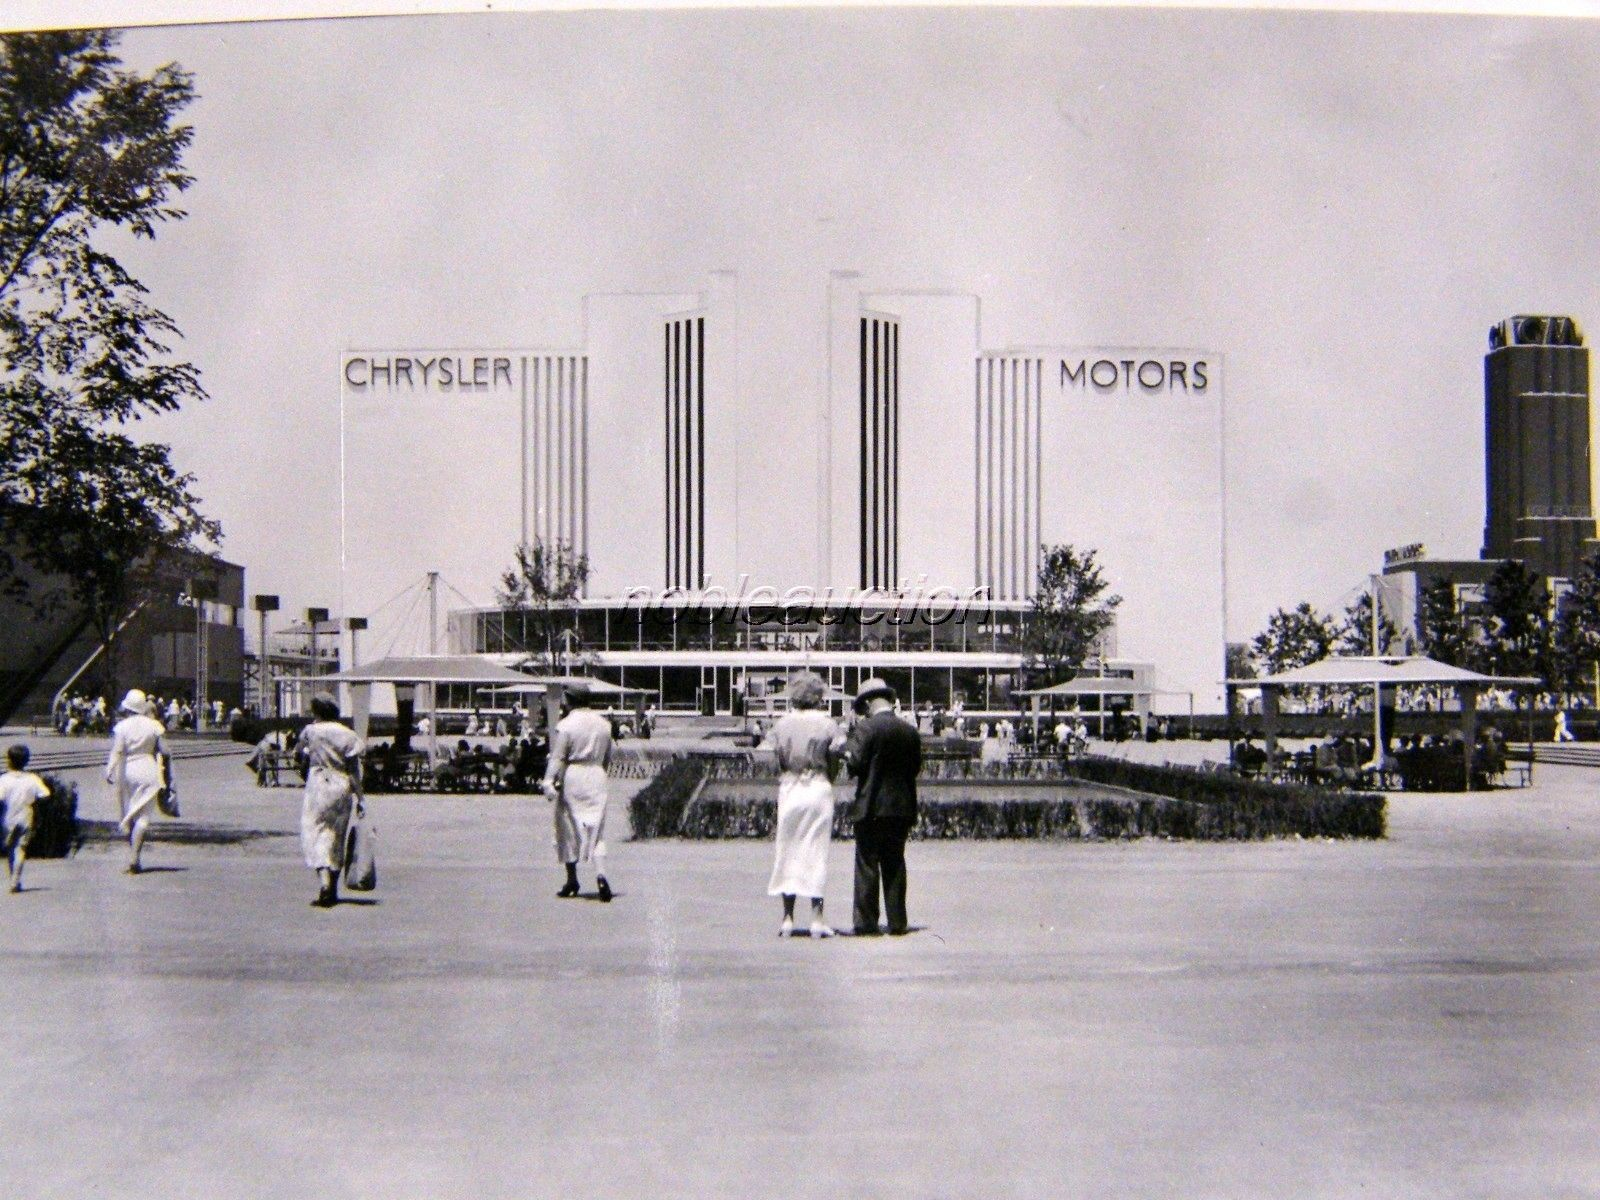 1933 Chrysler Motors GM Century of Progress Chicago Fair Photo Snapshot   eBay